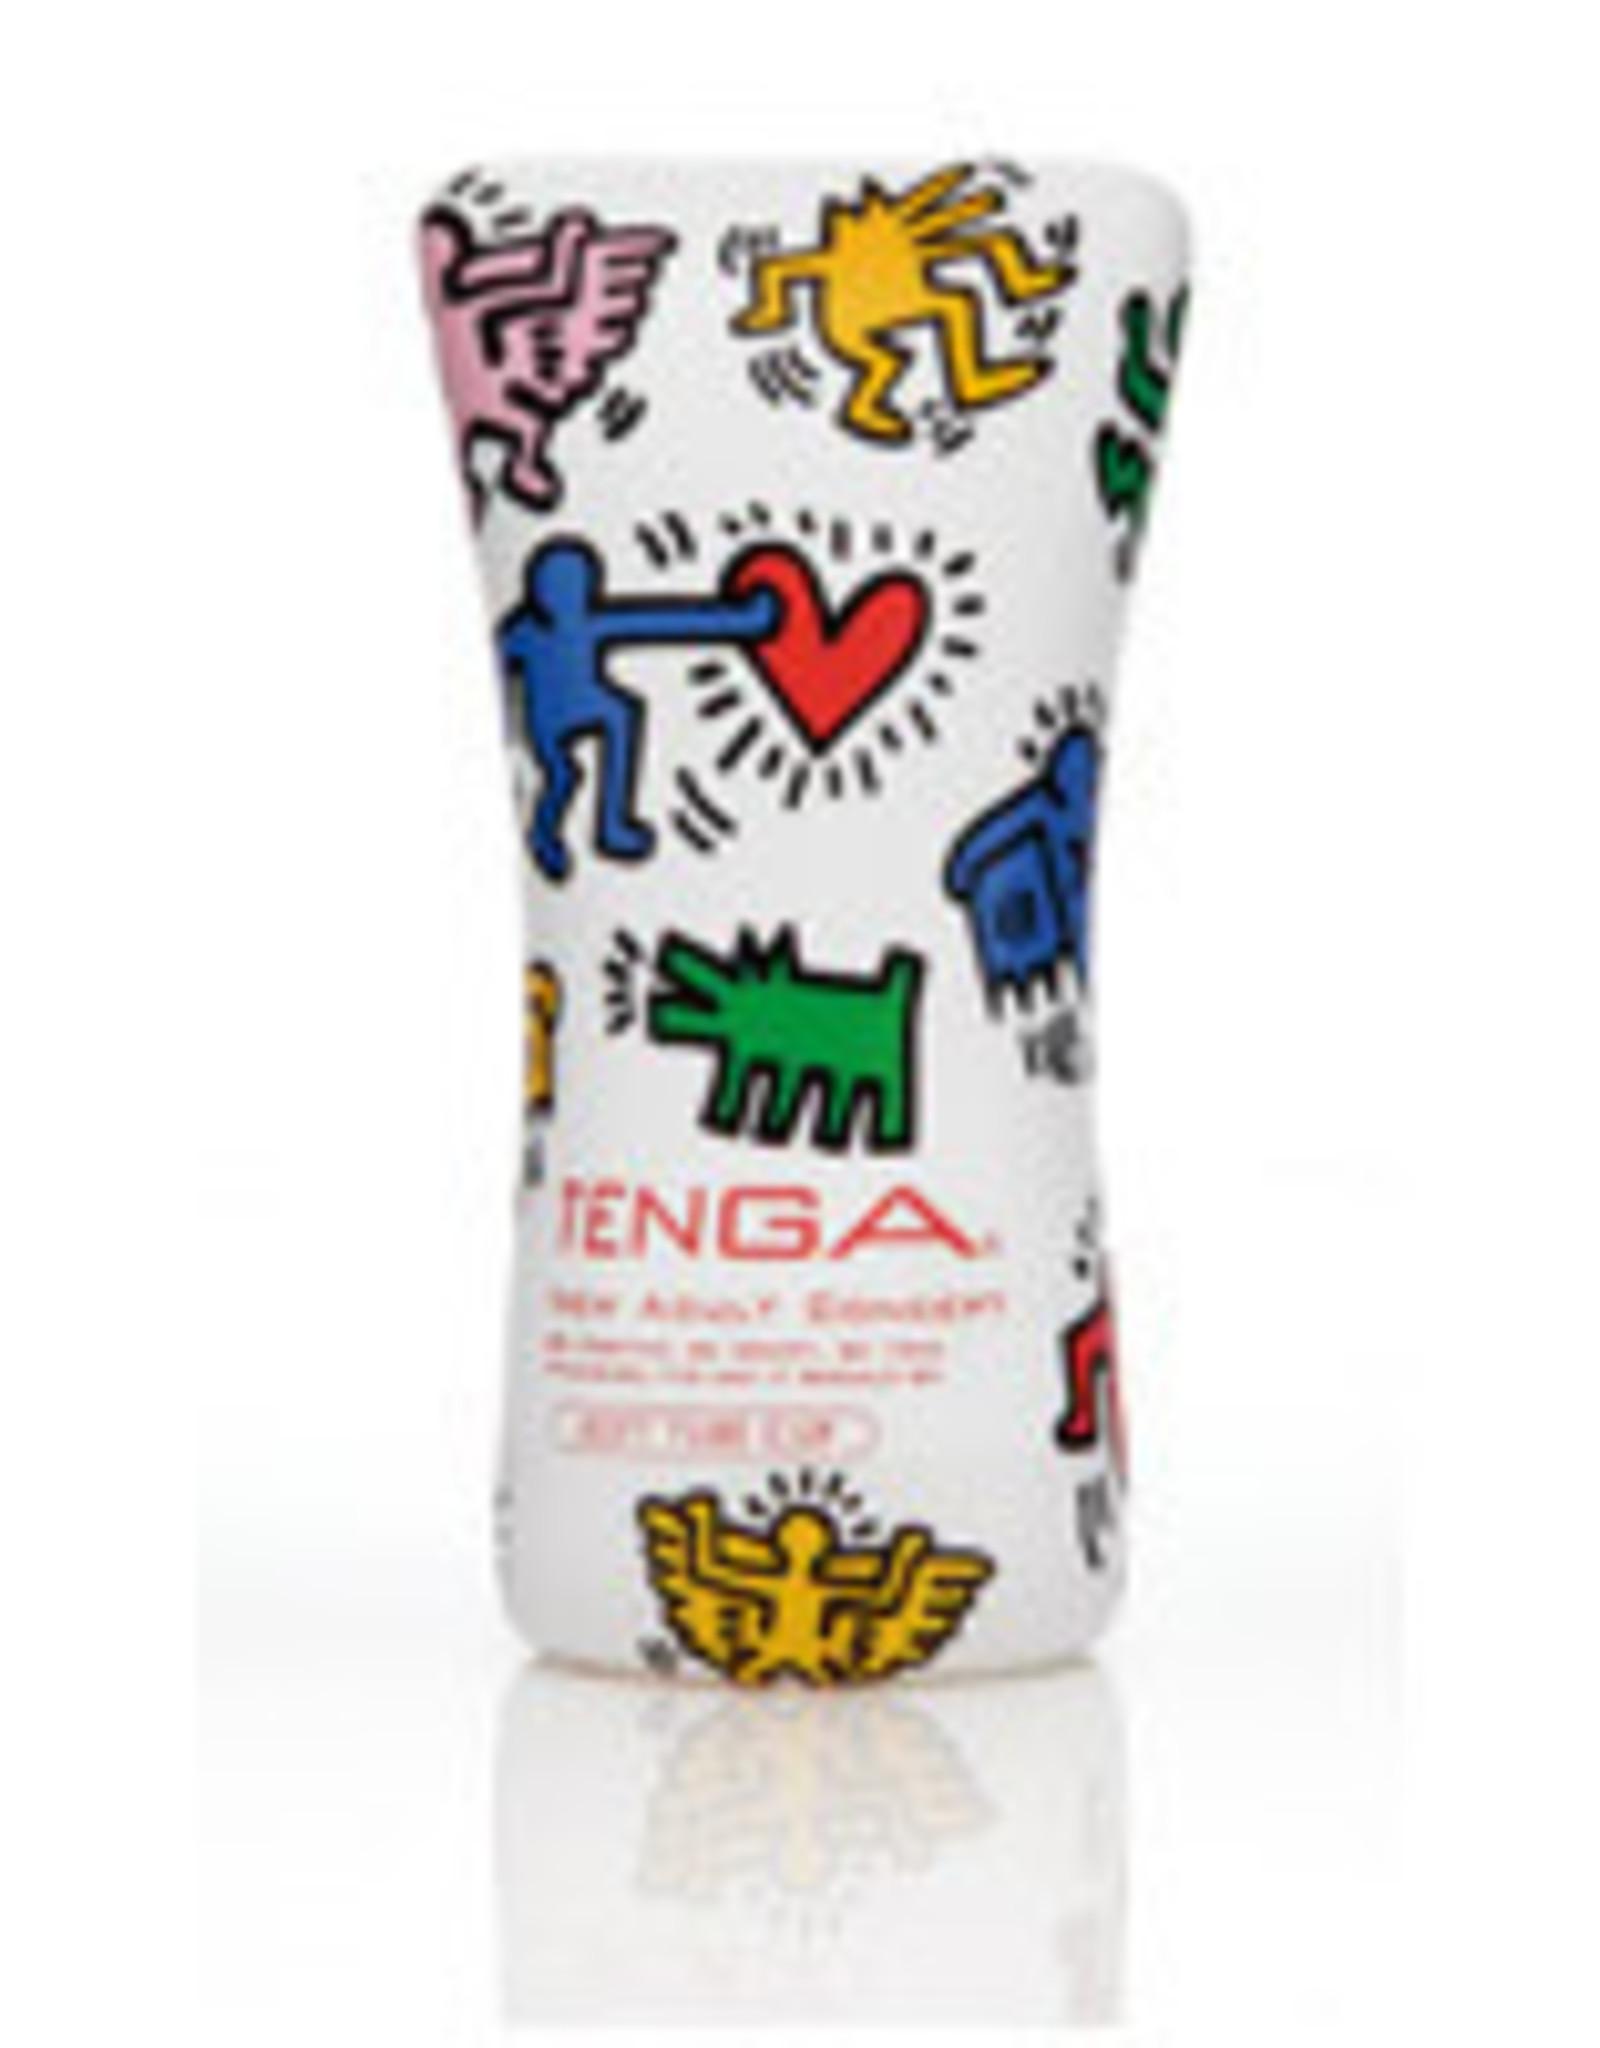 Tenga - Soft Tube Cup Masturbator - Keith Haring